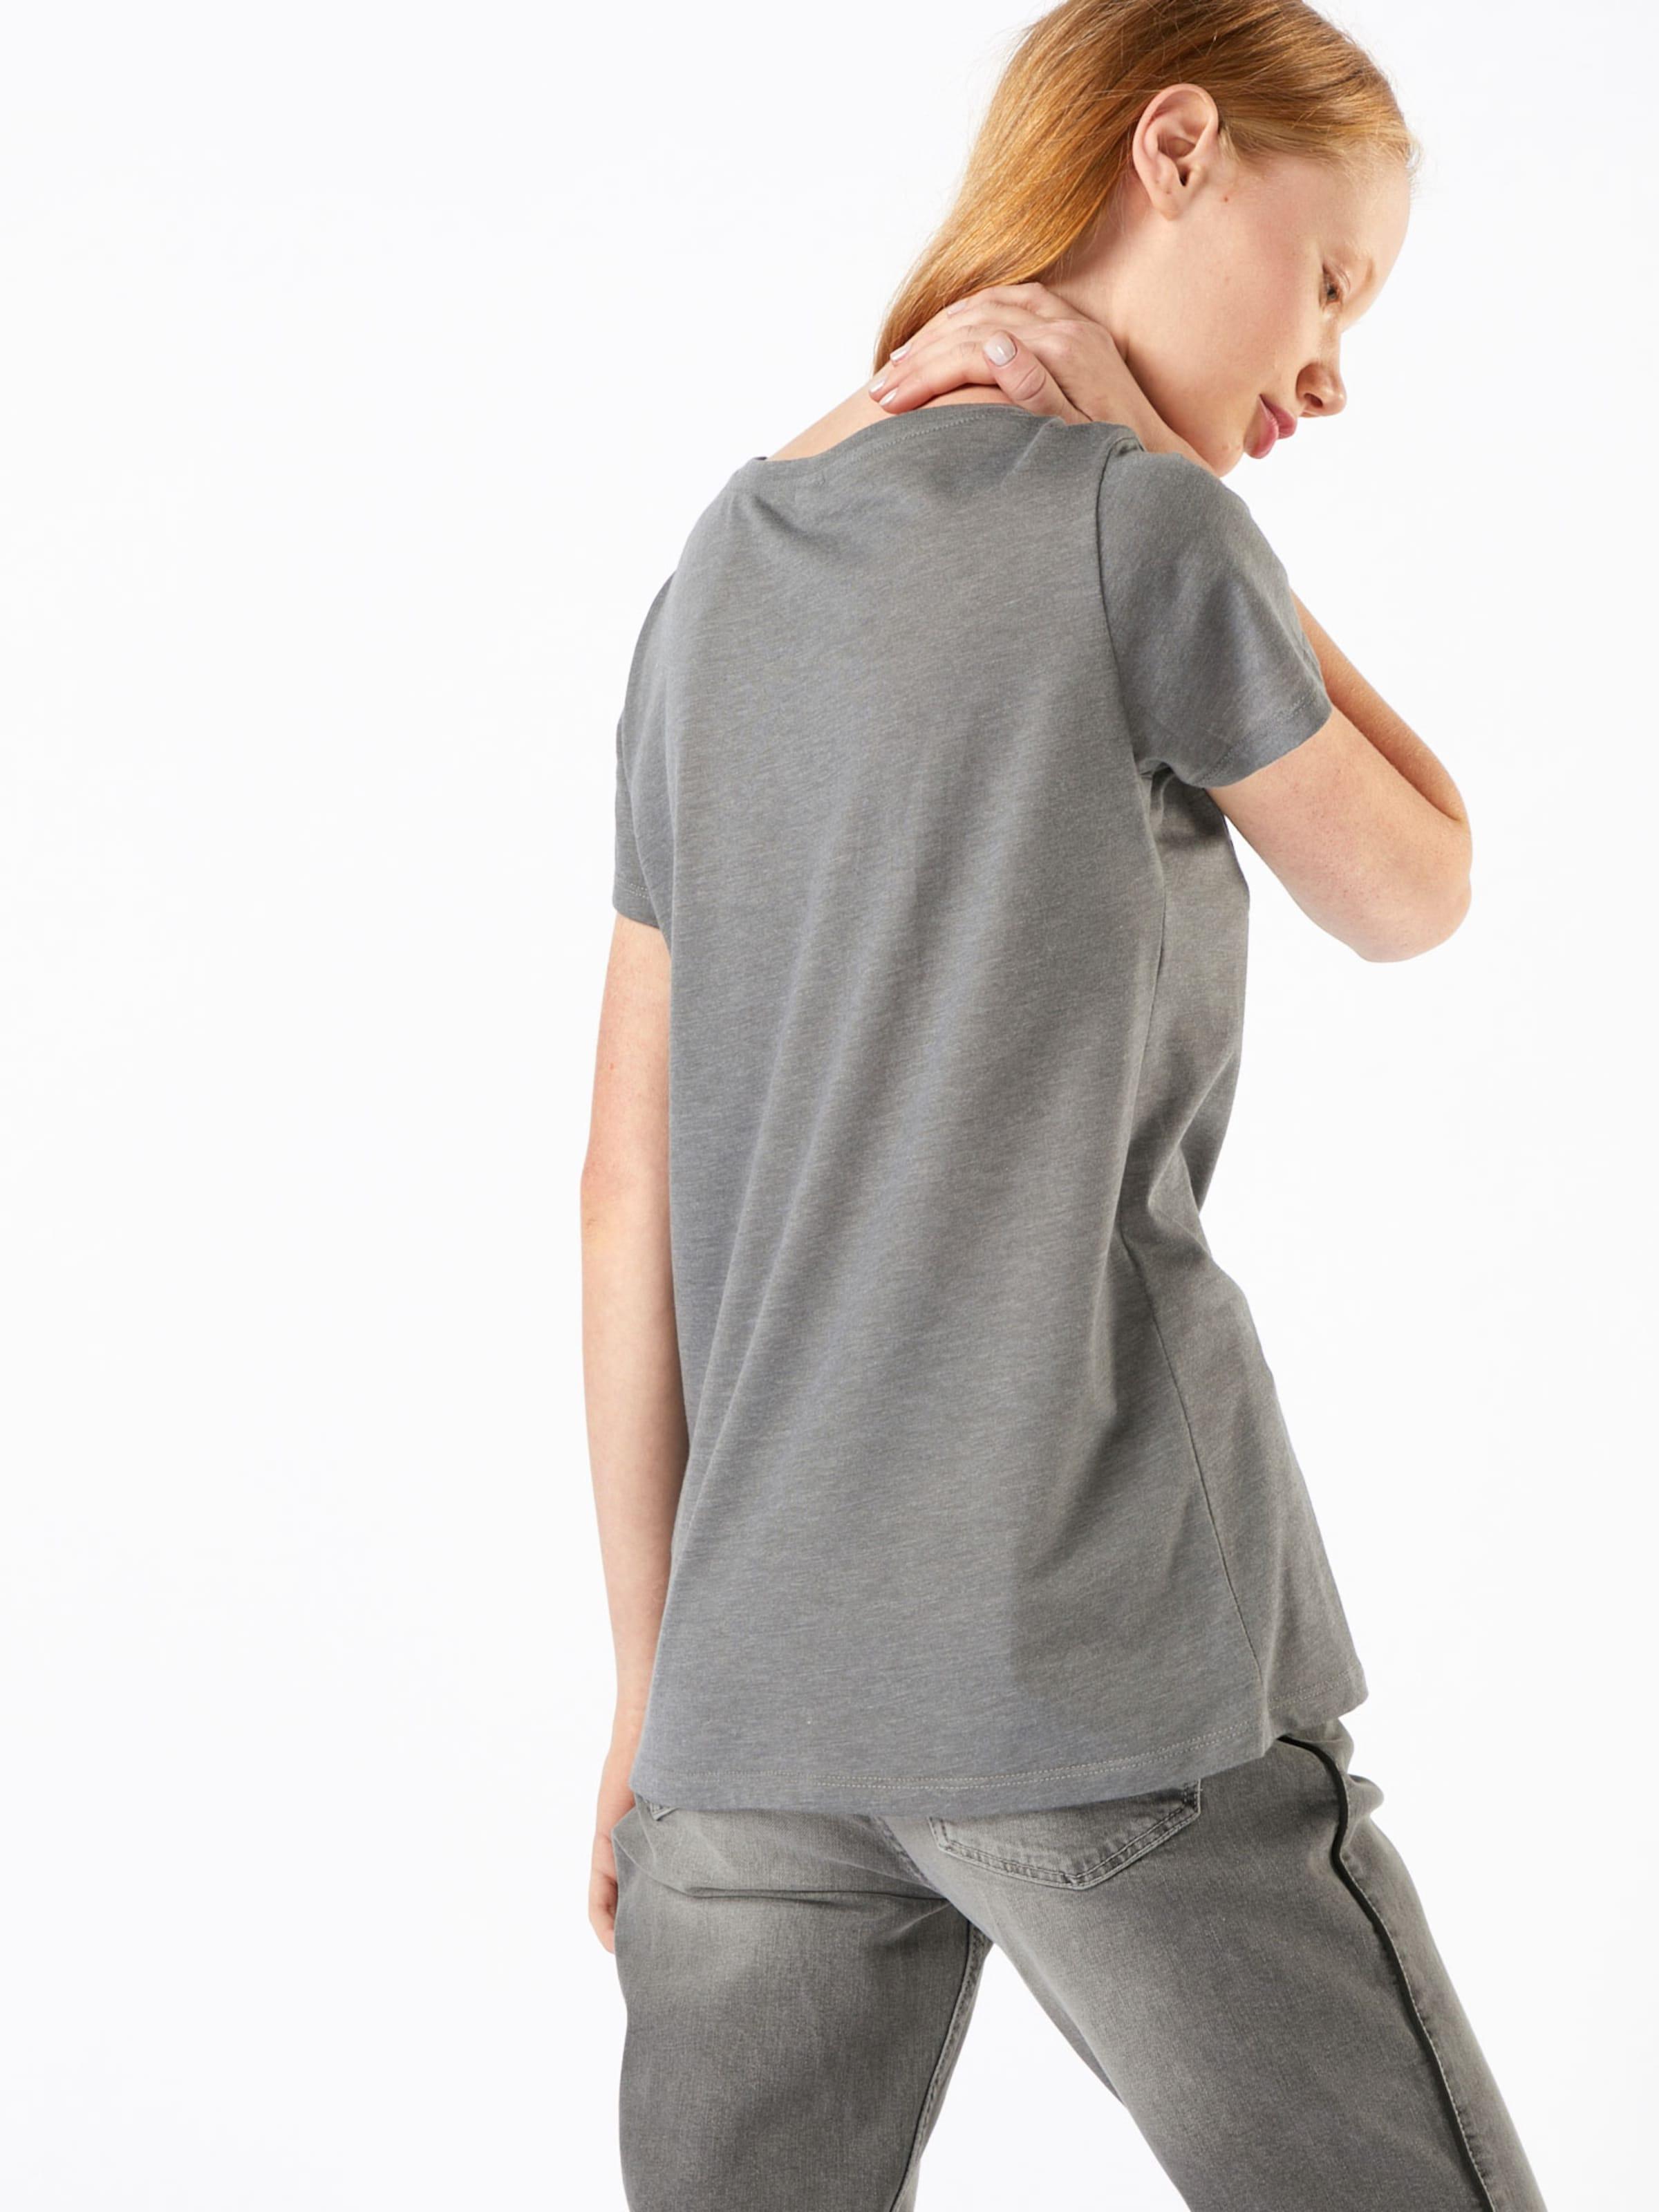 Iriedaily T 'blowball' shirt En ChinéBlanc Gris qzpSUMV